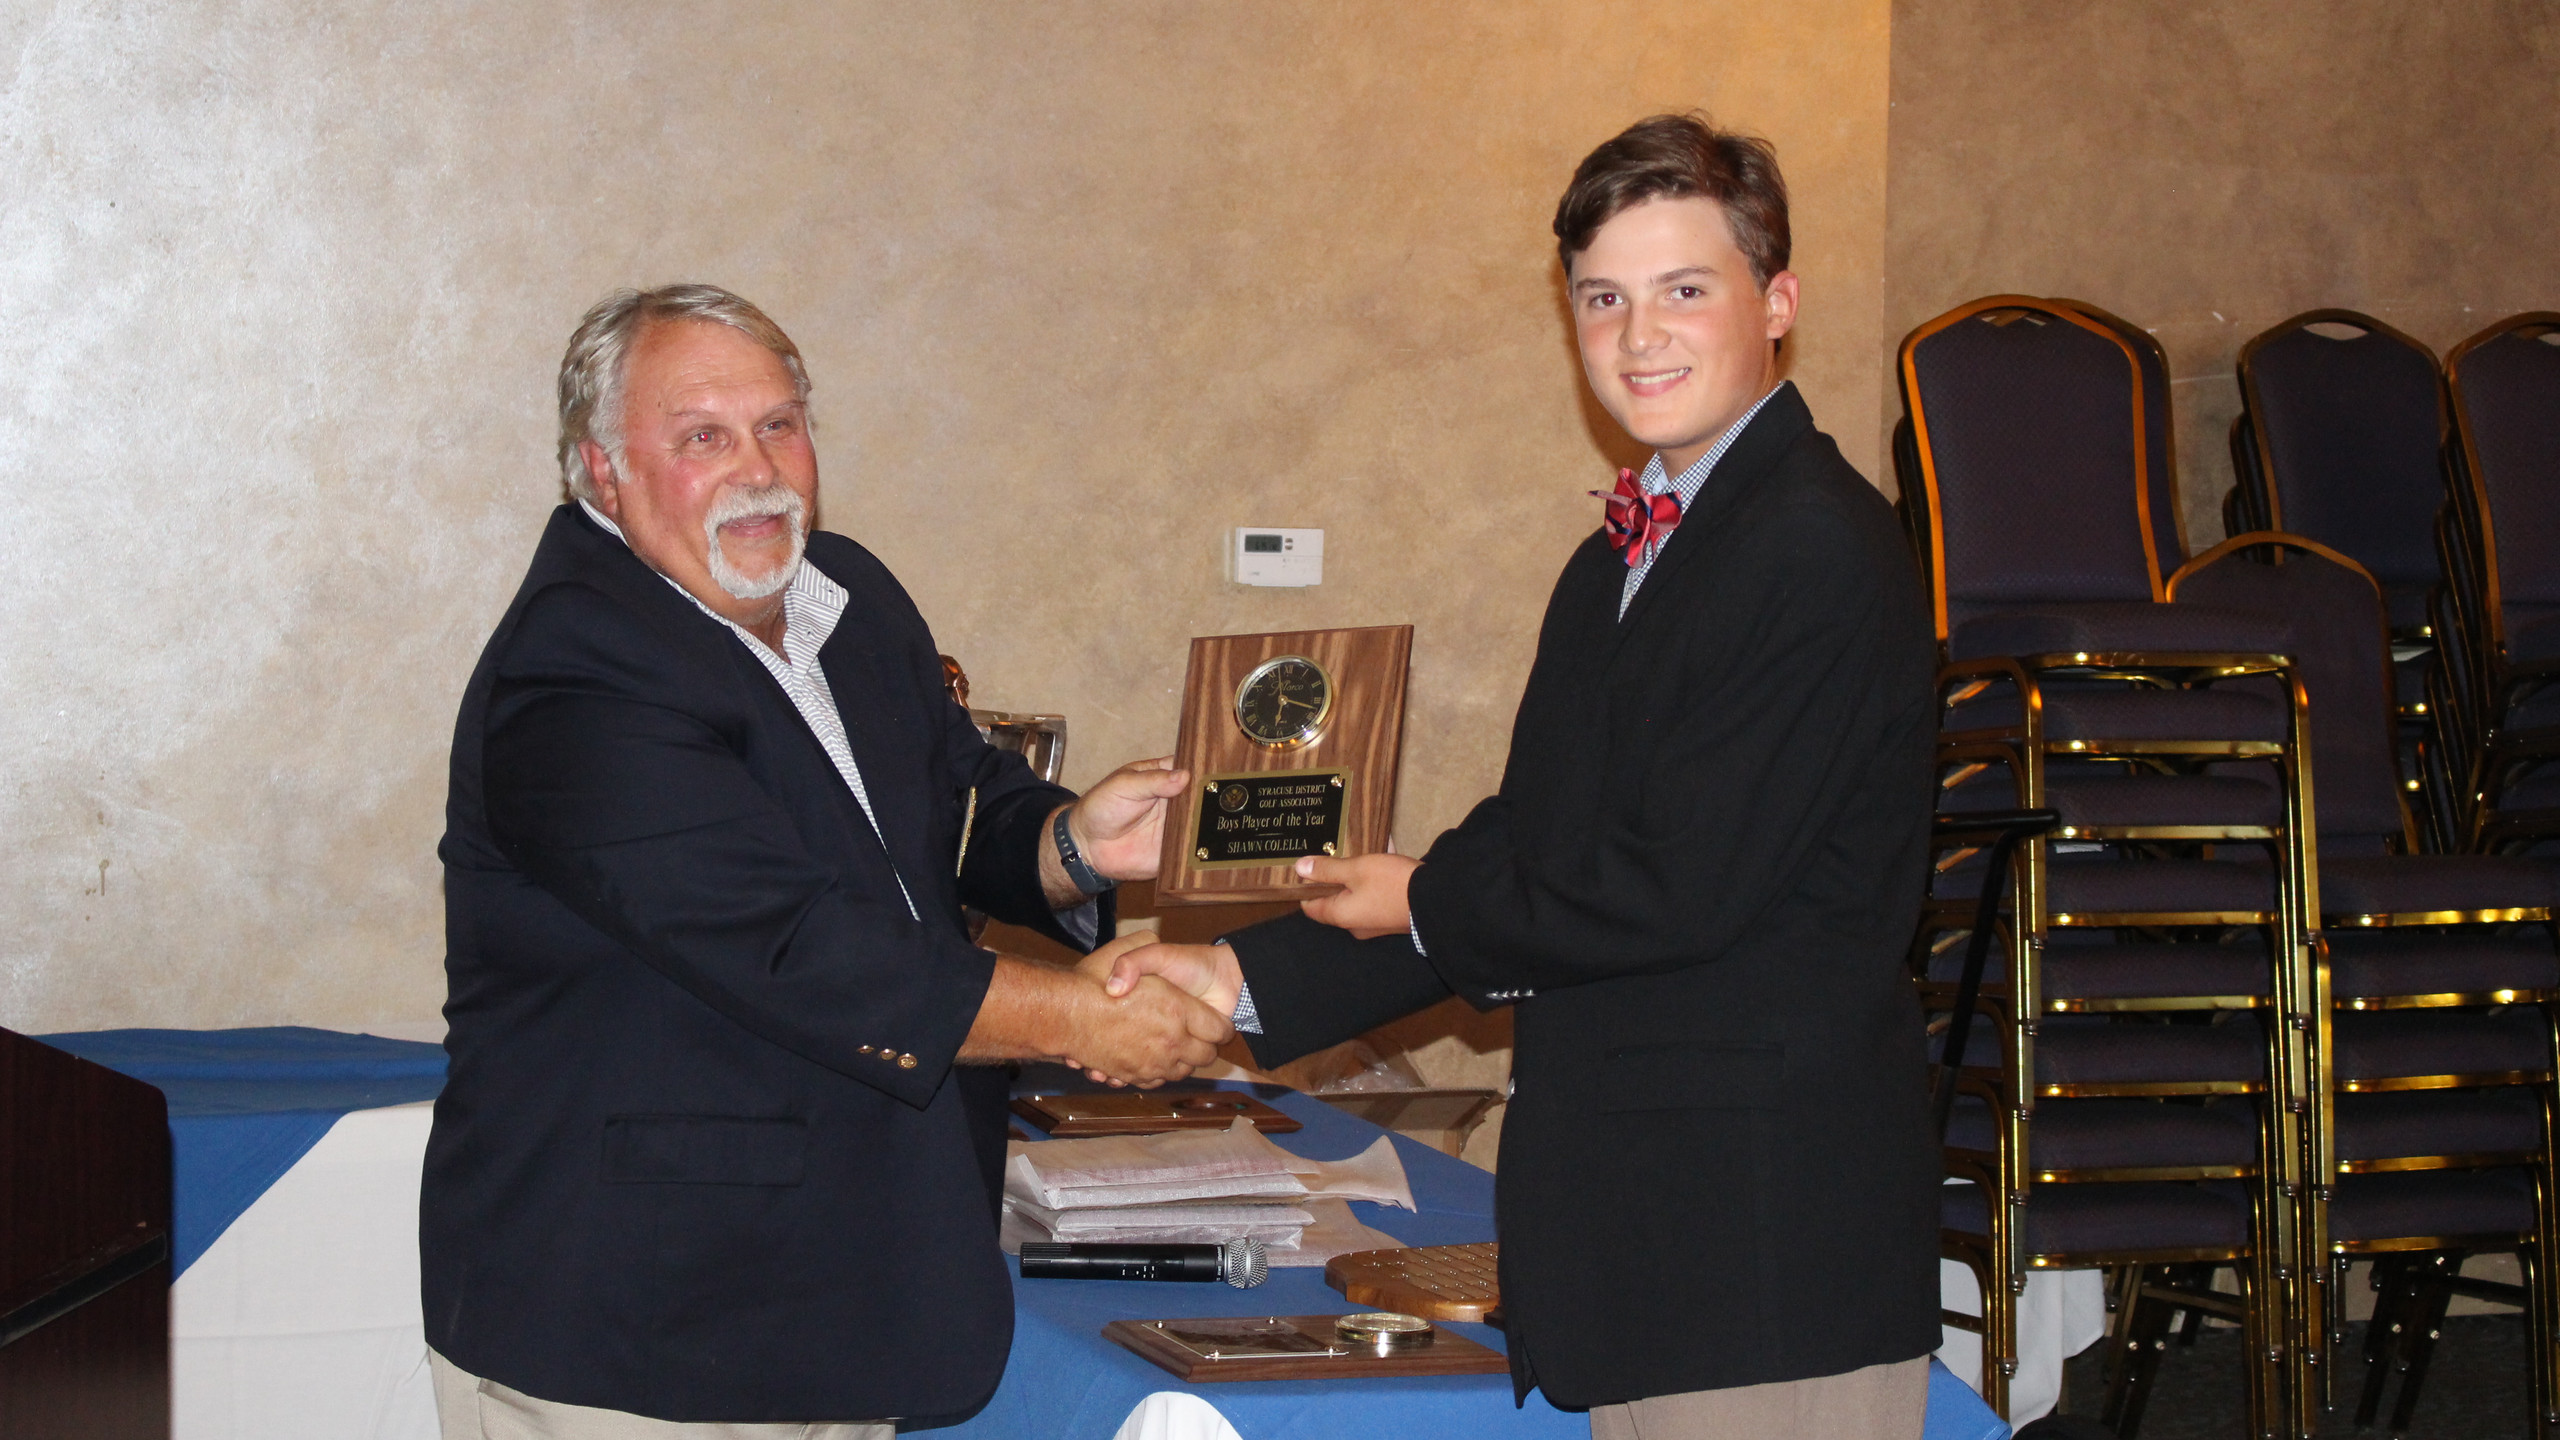 Boys Player of the Year Shawn Colella with Gene Meyle, SDGA Junior Chairman.